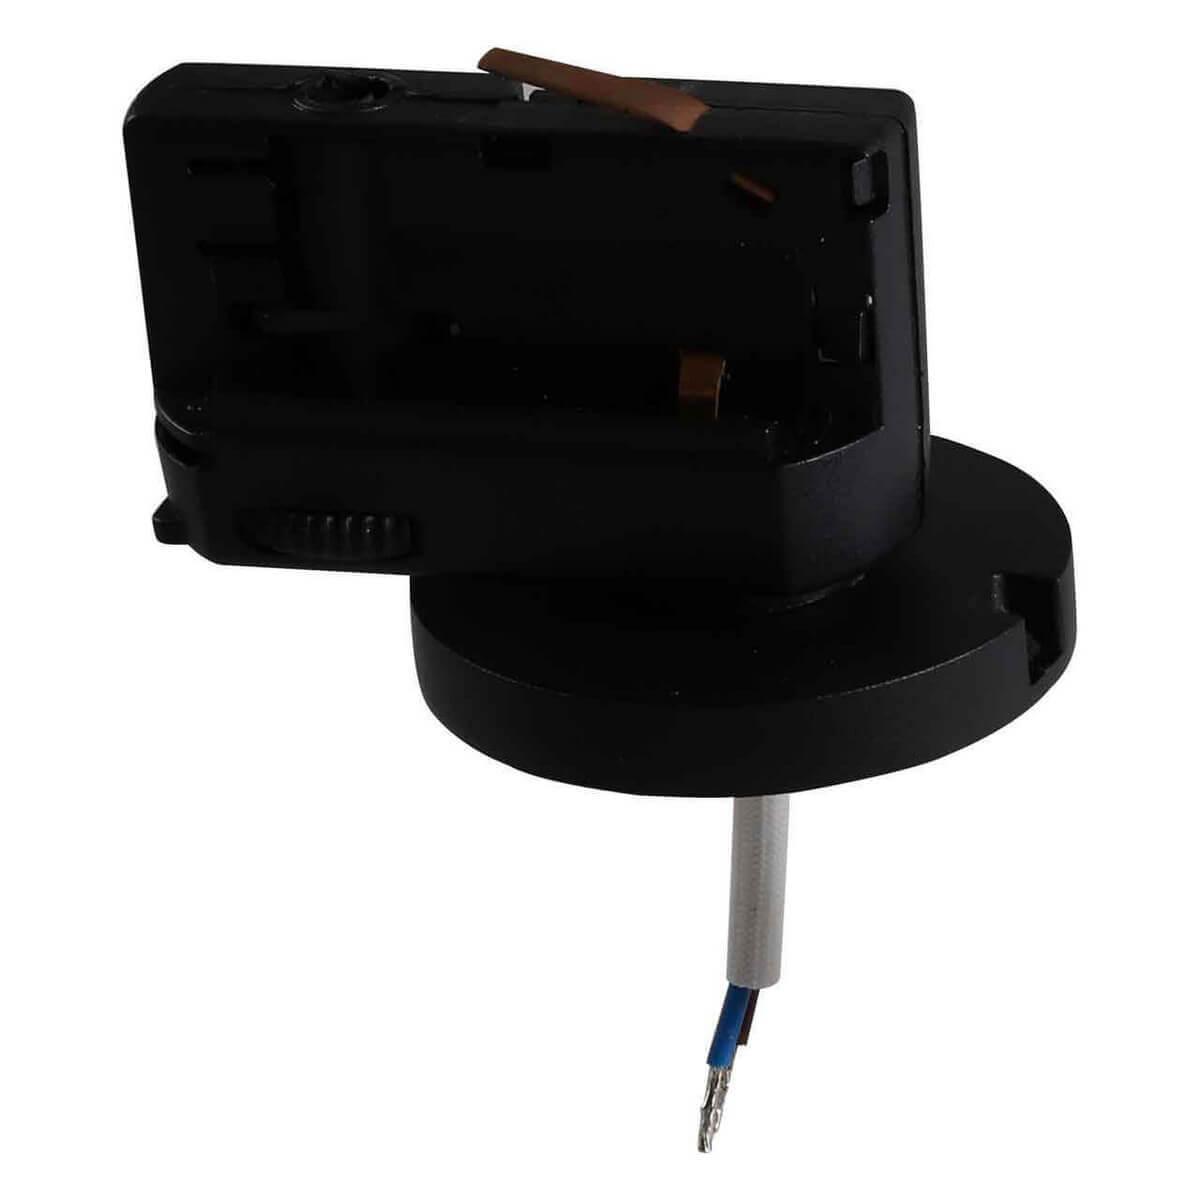 Адаптер для шинопровода Lightstar 594077 Asta Black (для трехфазного шинопровода)